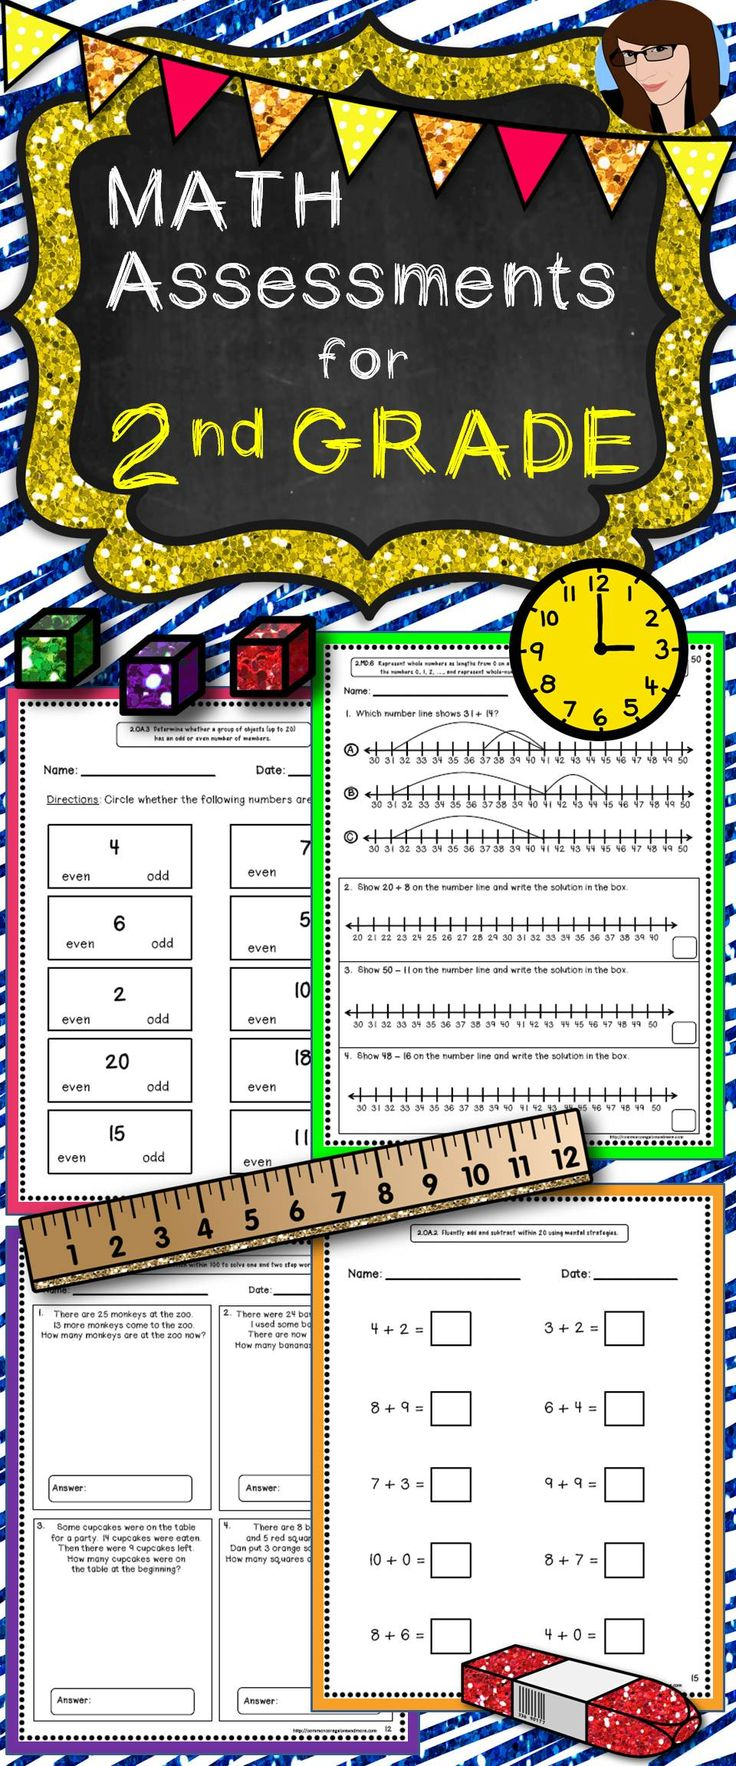 Math Assessments for 2nd Grade